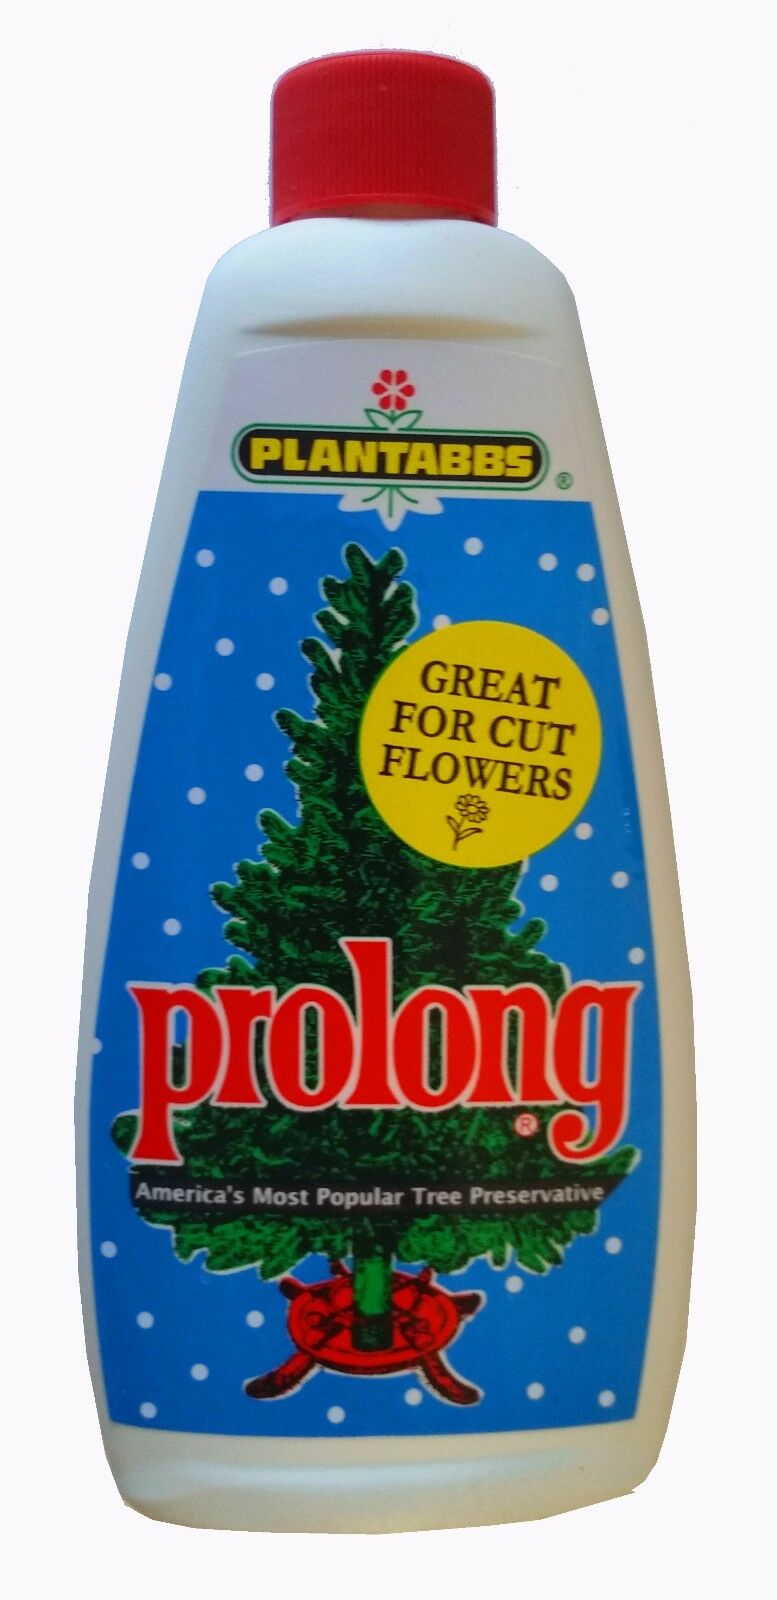 8 Pack Prolong (Christmas Tree & Cut-Flower nutrient)